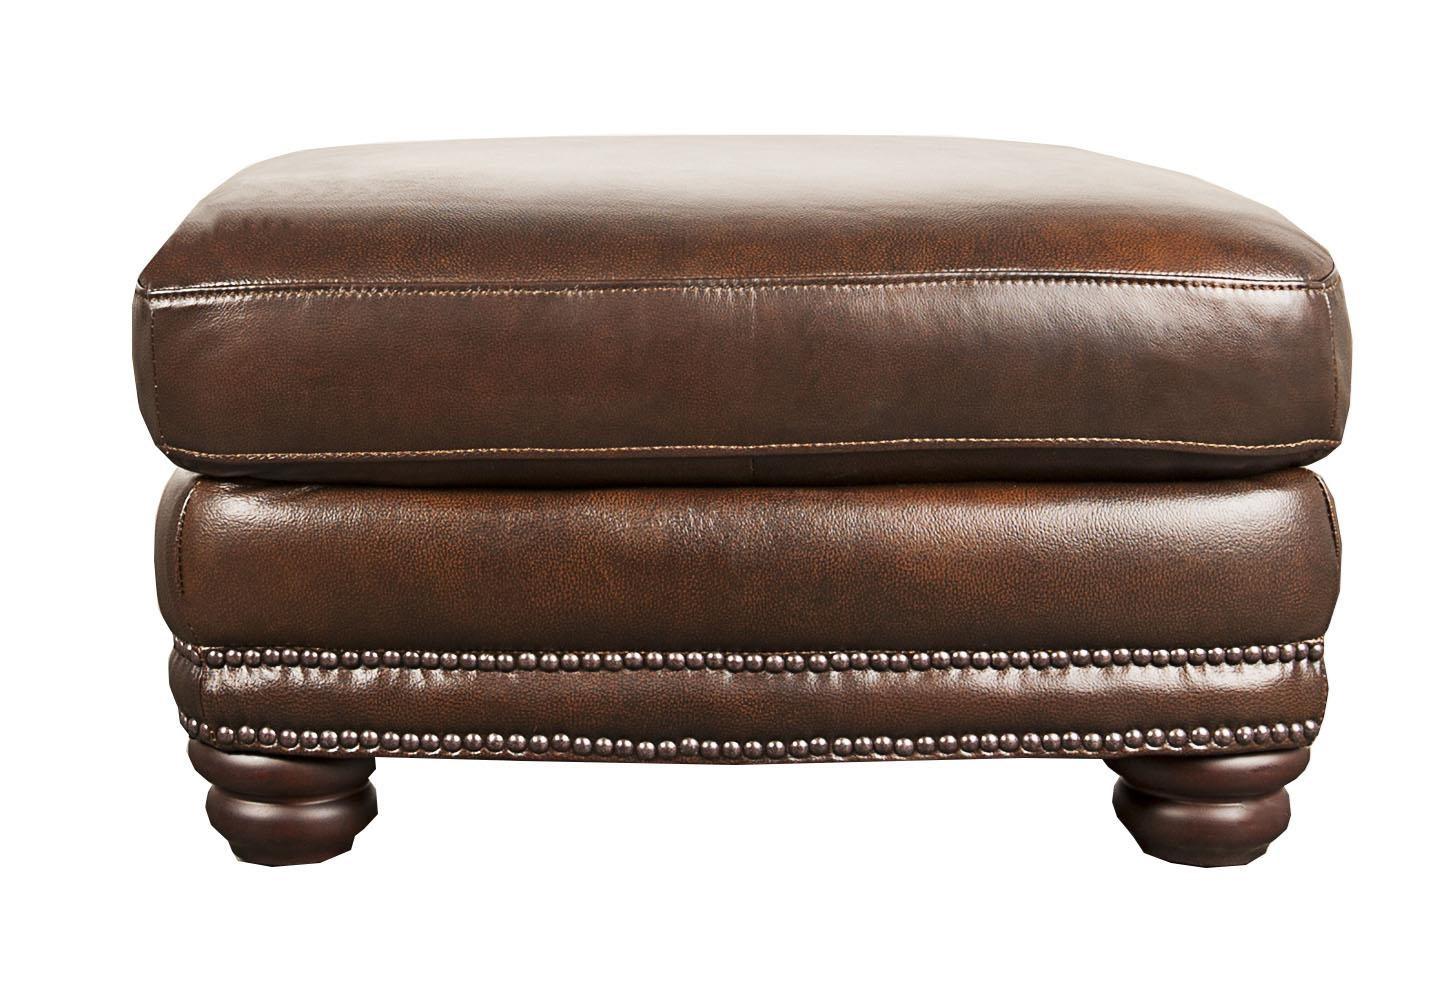 Morris Home Furnishings Harrison Harrison 100% Leather Ottoman - Item Number: 114187449